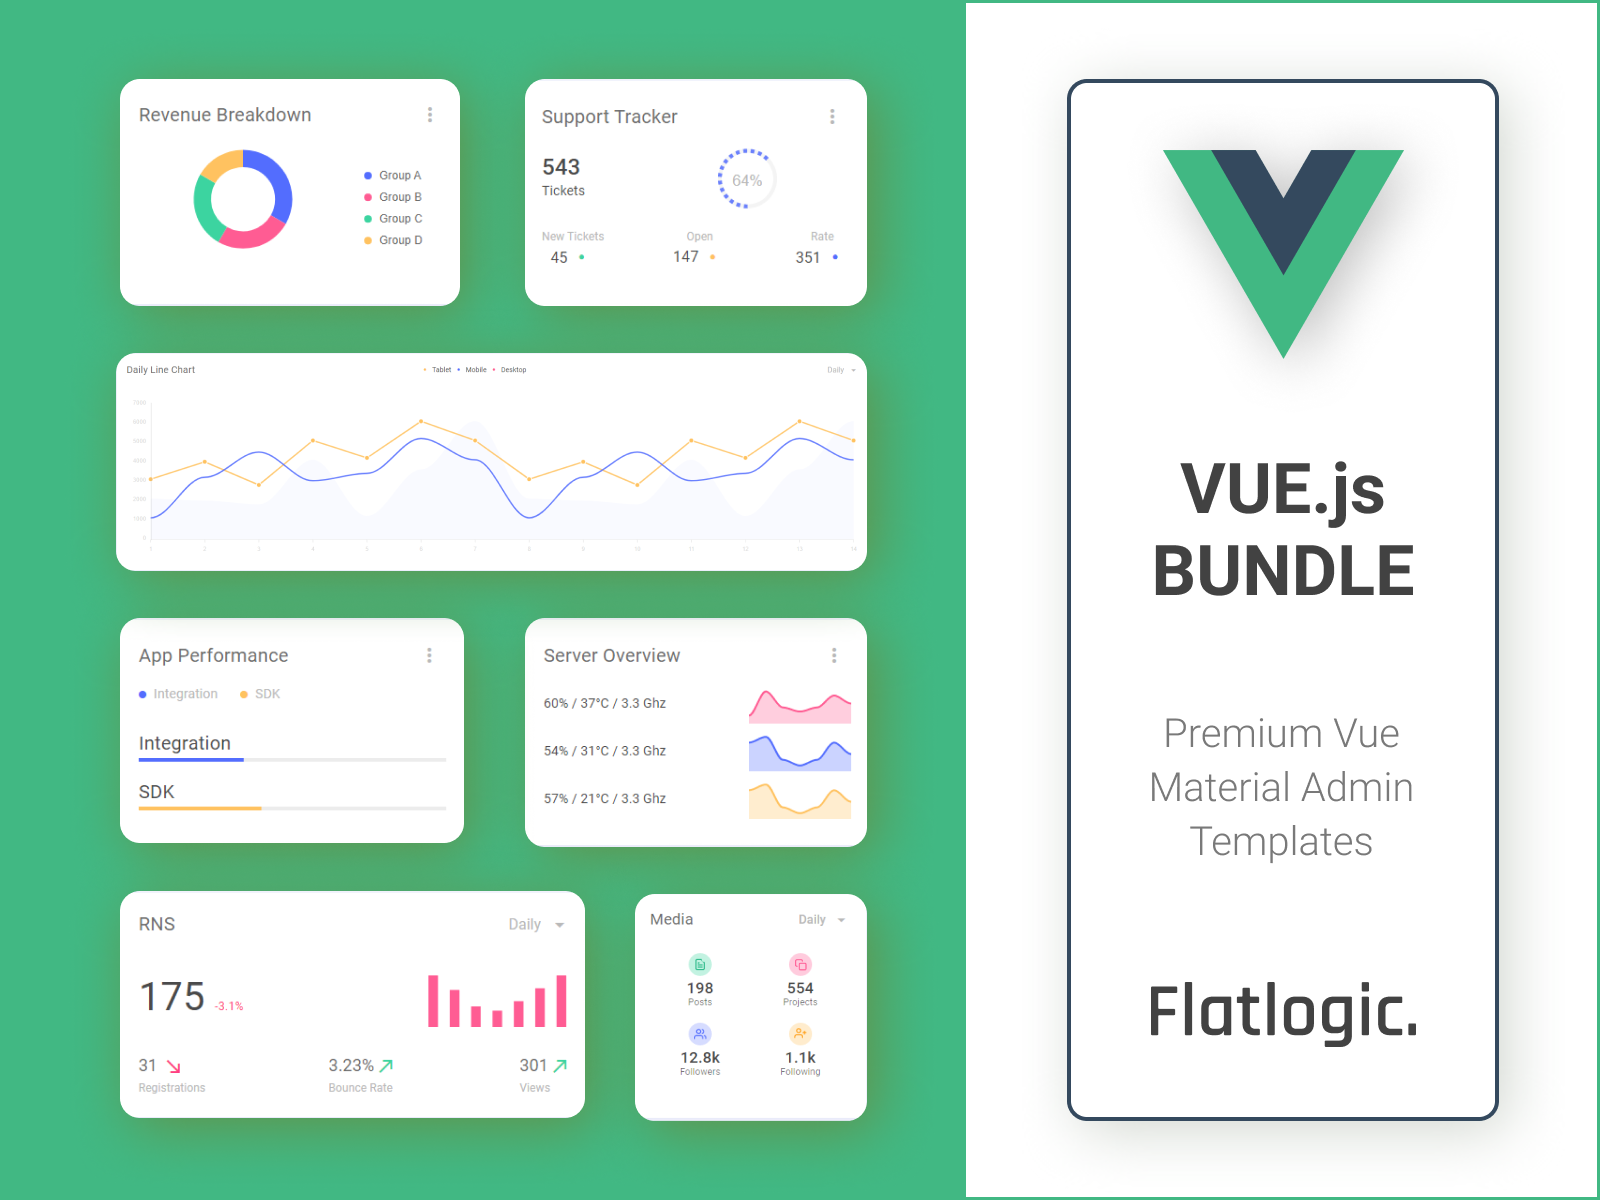 Flatlogic Team has Released the Vue.js Bundle!